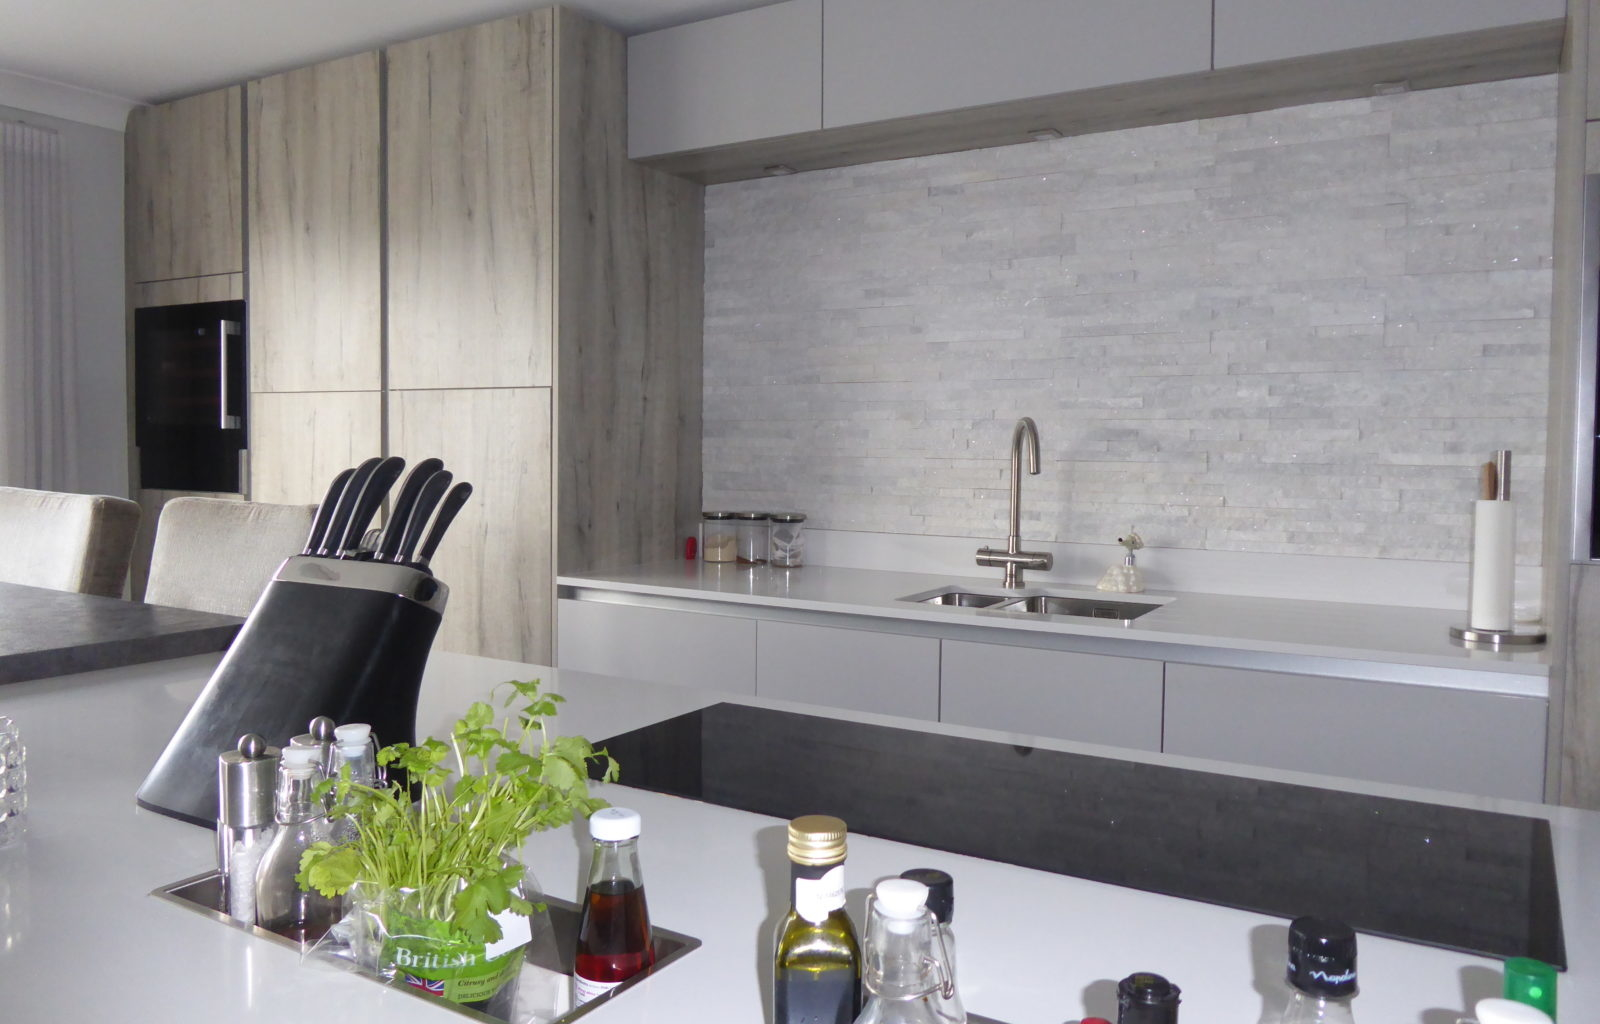 Kitchen, Texture, Wood effect, Minimal, Split Mosaic tiles, Stylish